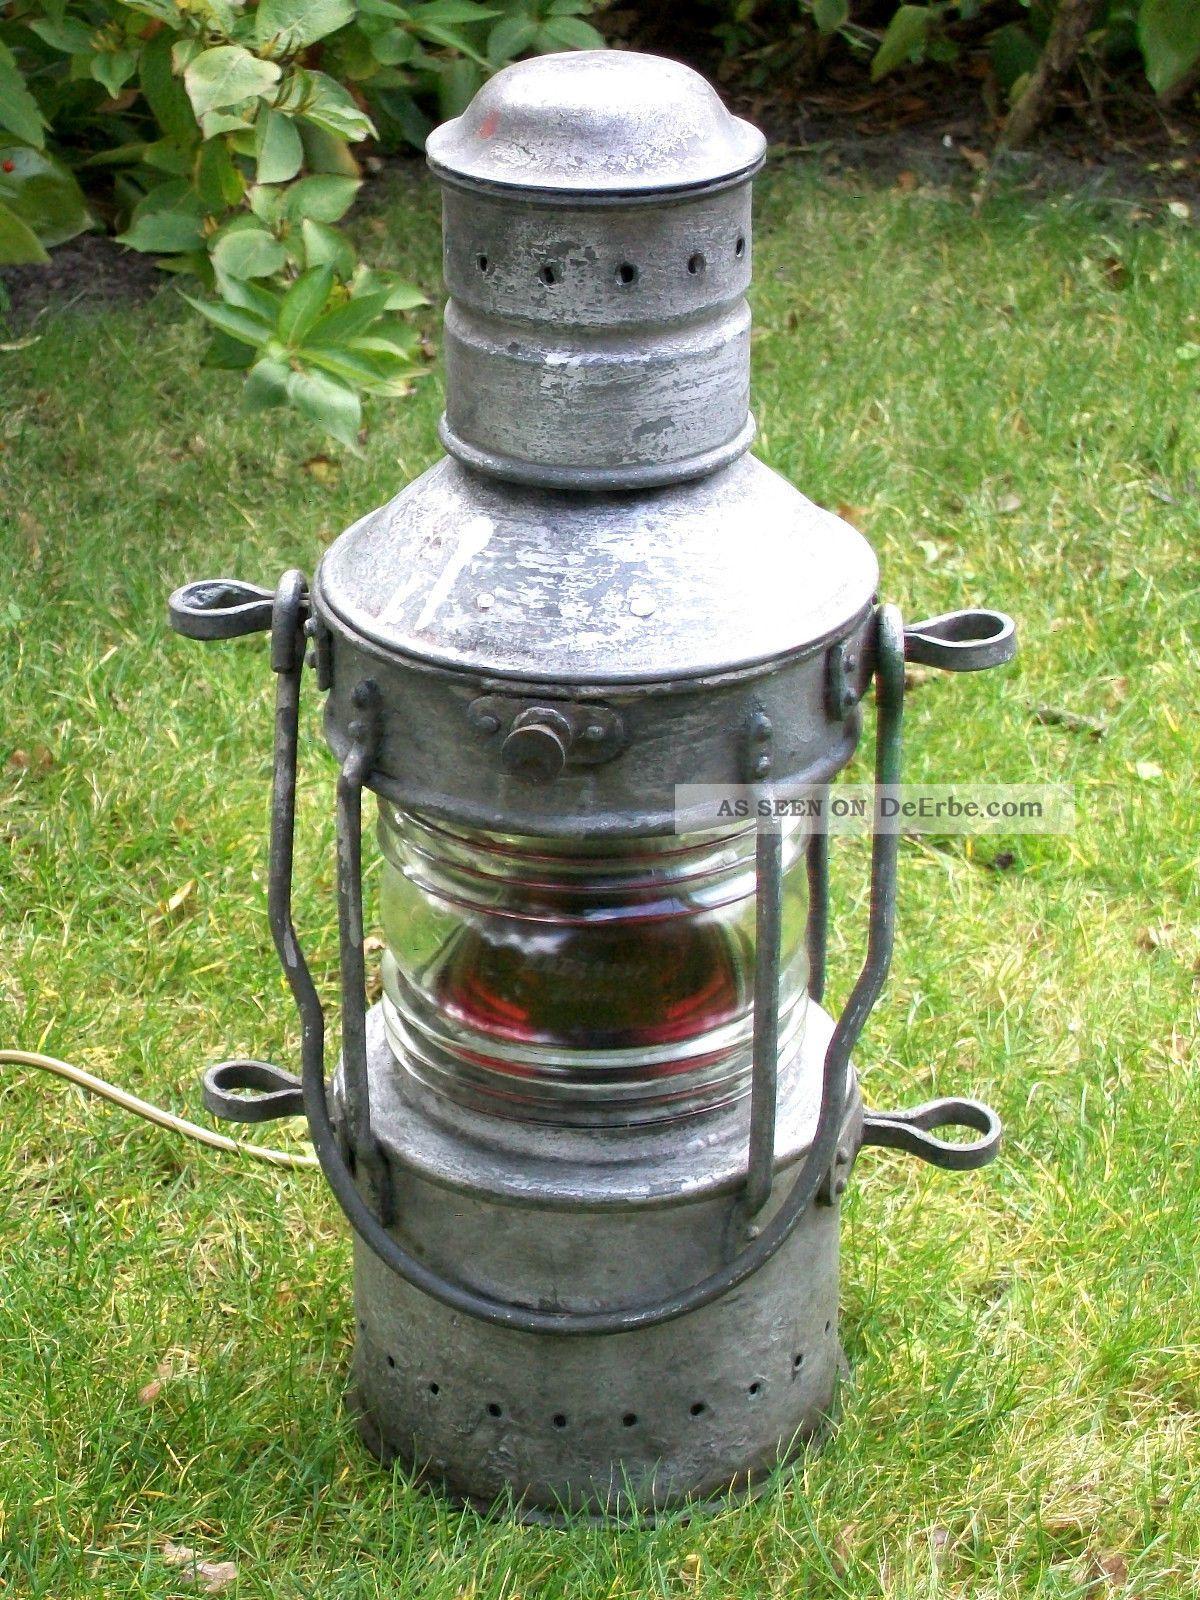 alte schiffslampe positionslampe um 1940 roten glaseinsatz elektr umger stet. Black Bedroom Furniture Sets. Home Design Ideas